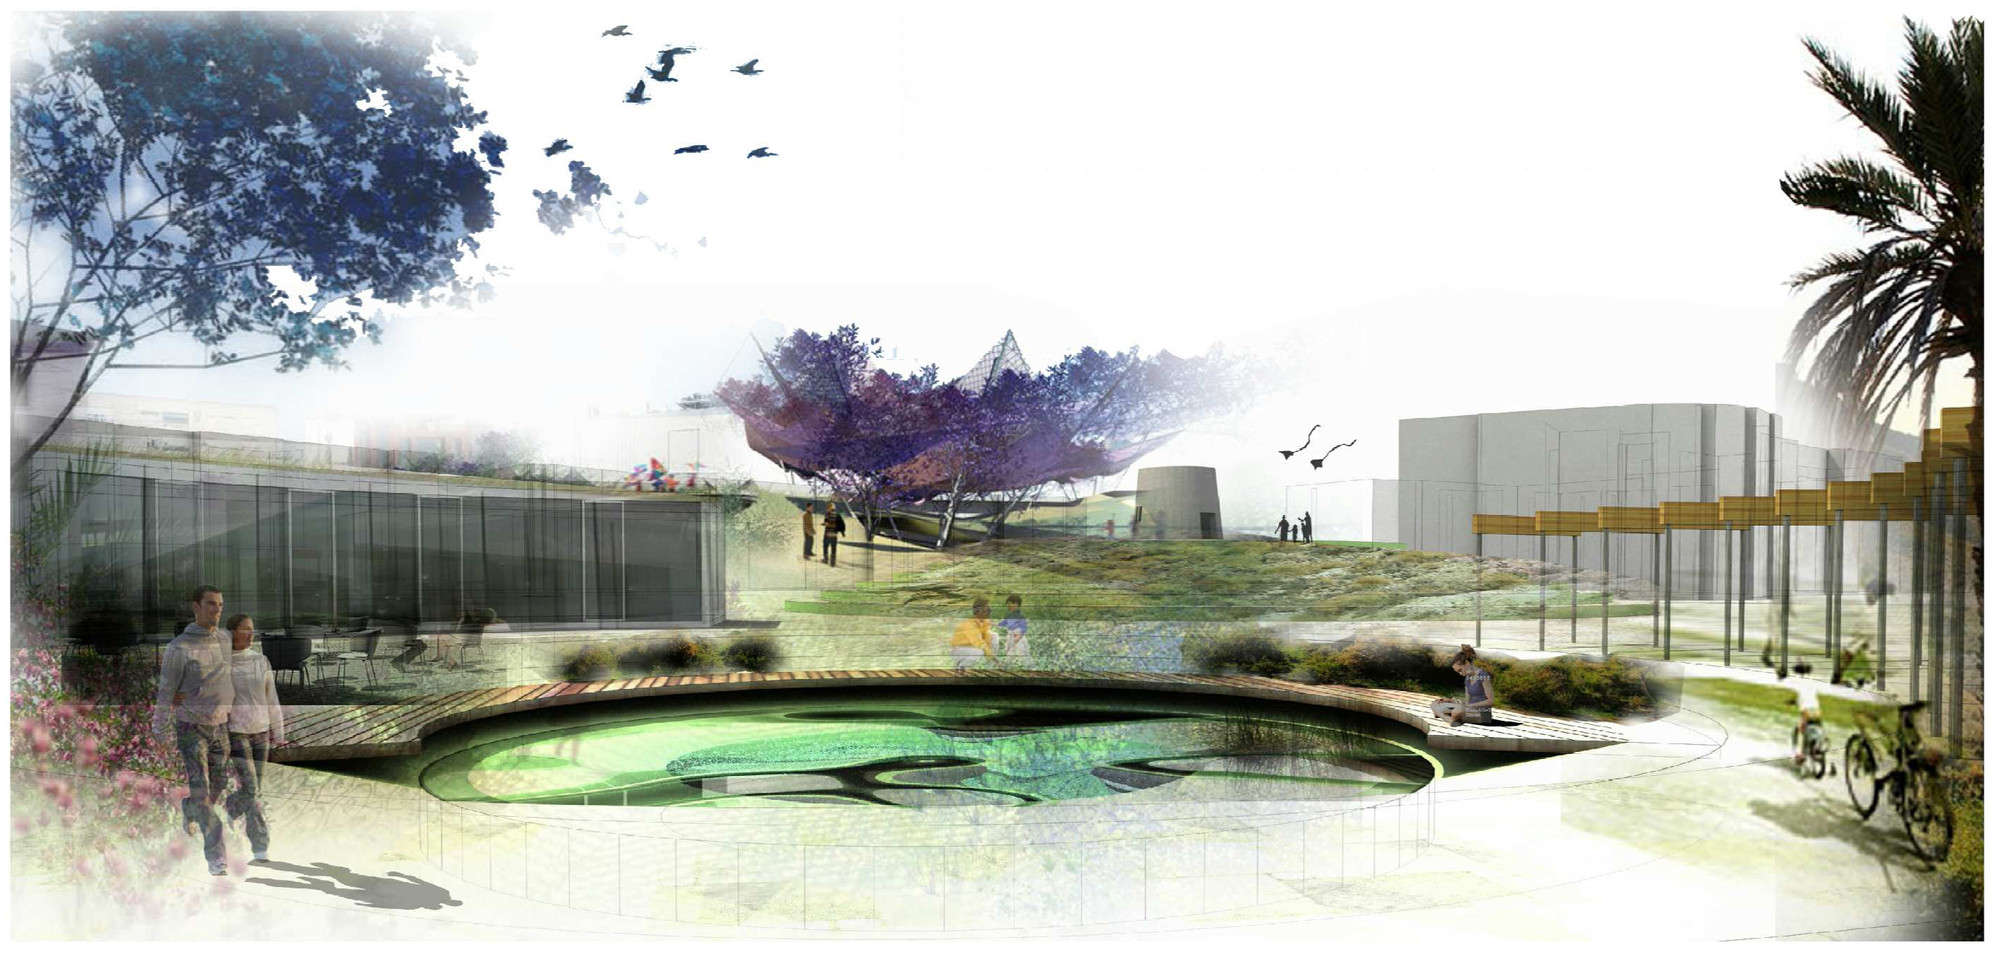 Parque urbano productivo, Primer Lugar en Holcim Awards Next Generation Europe 2014, Cortesia de DAT Pangea